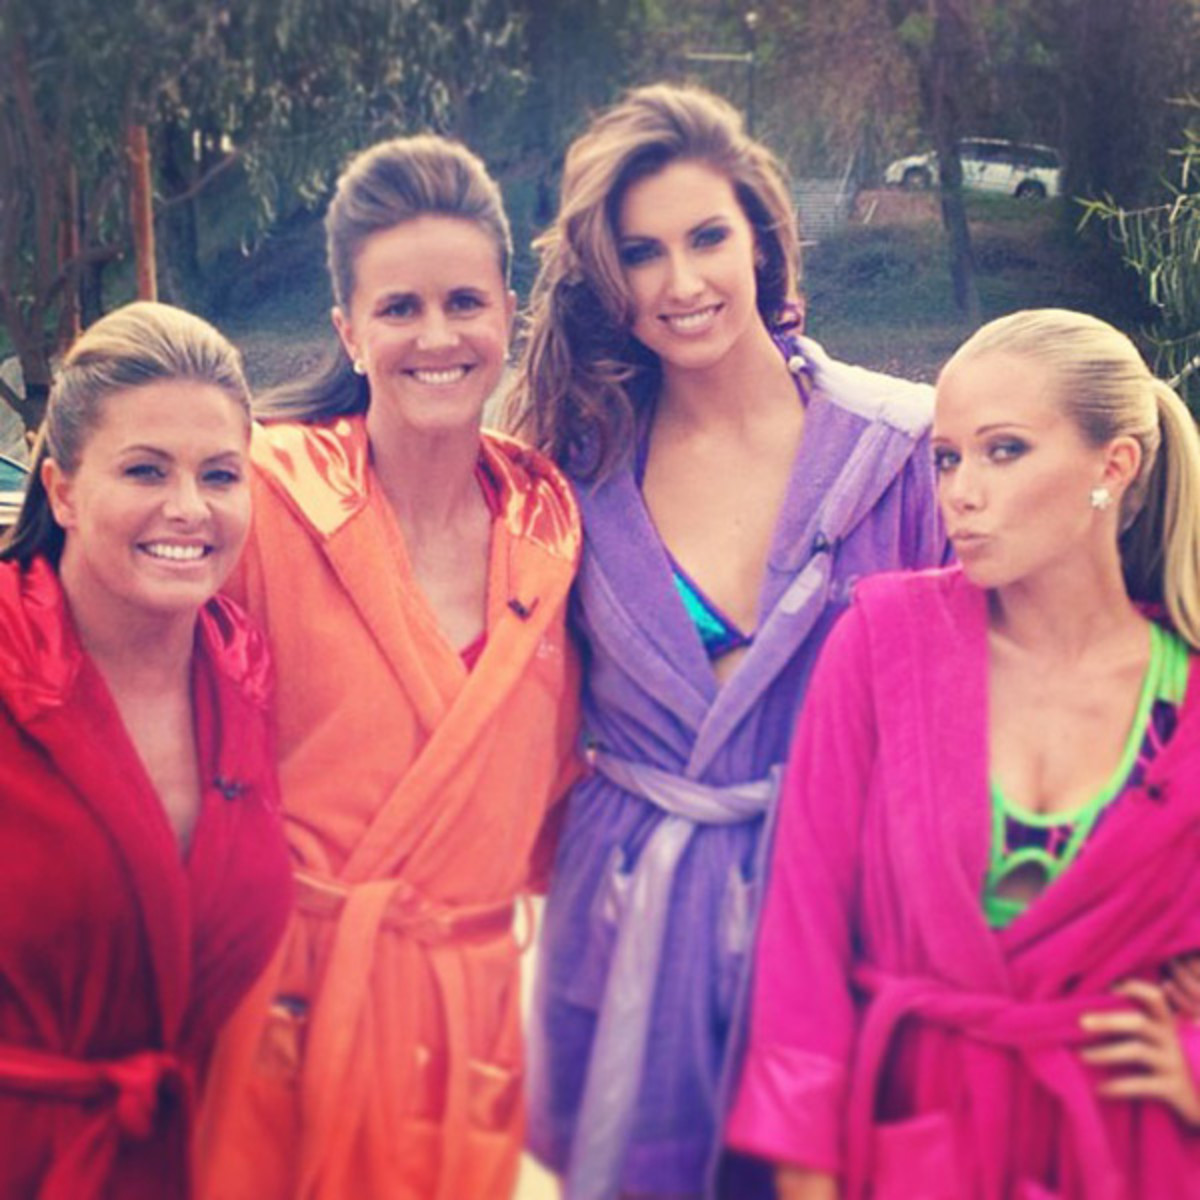 Nicole Eggert, Brandi Chastain, Katherine Webb and Kendra Wilkinson :: @_katherinewebb